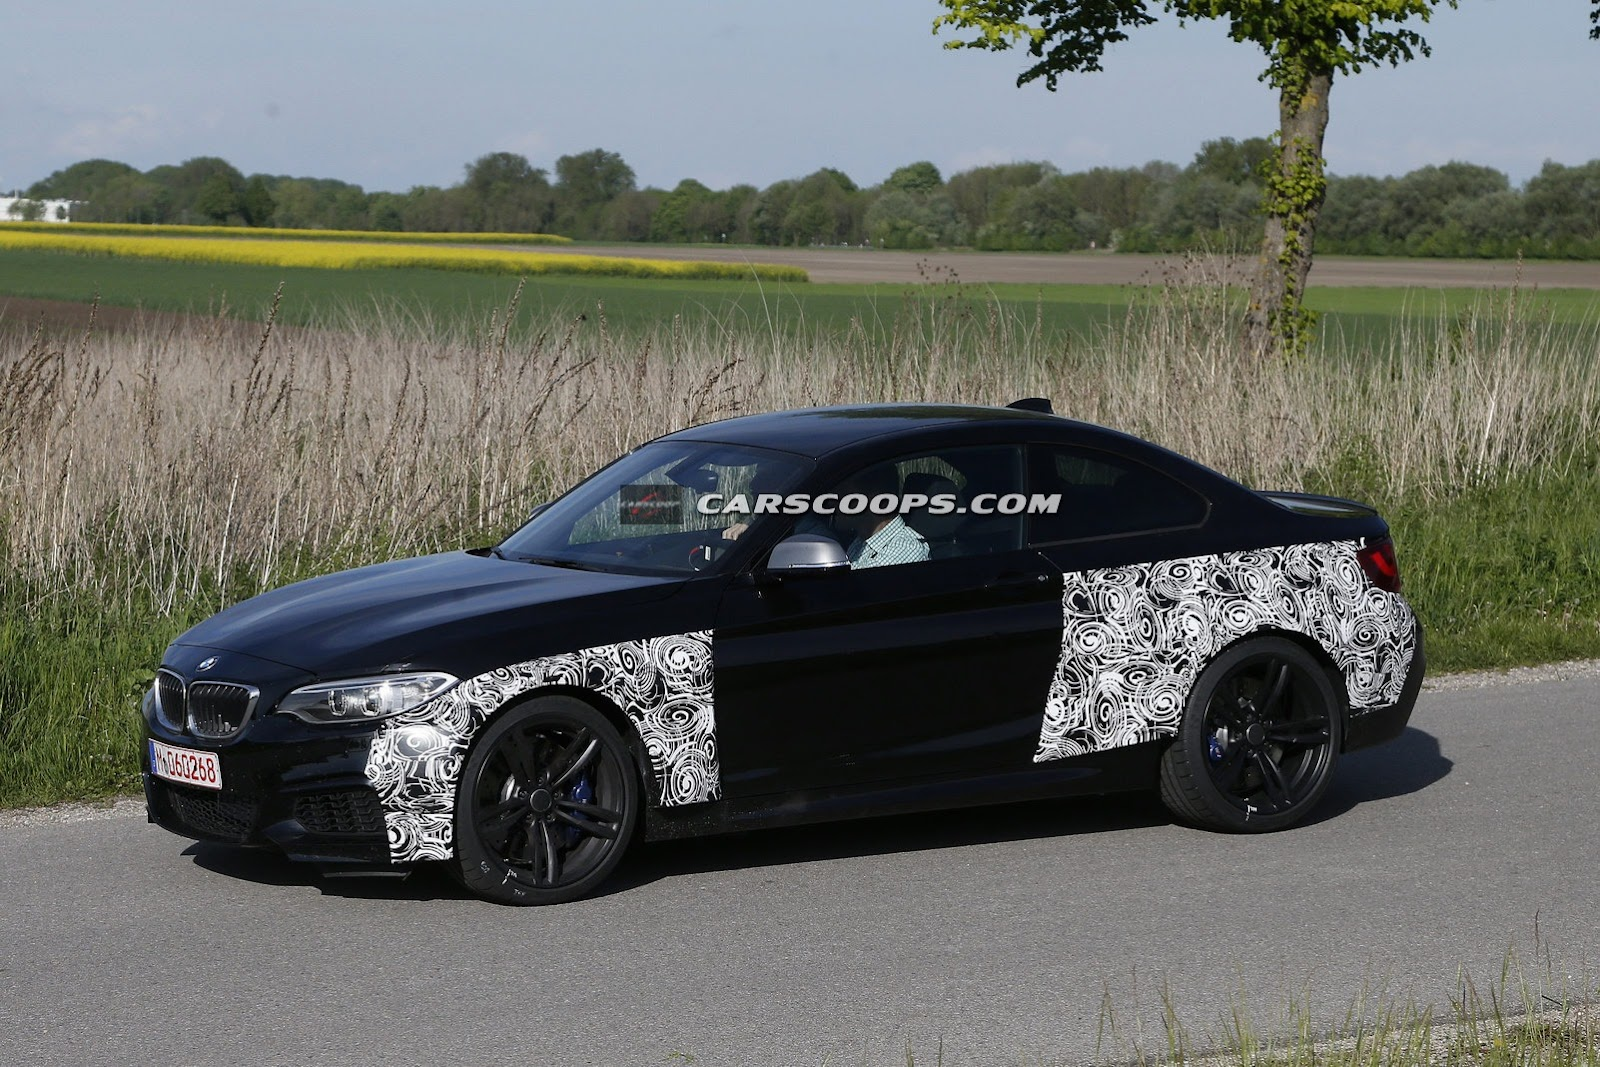 2016 - [BMW] M2 [F87] - Page 3 BMW-M2-Carscoops-4%25255B3%25255D